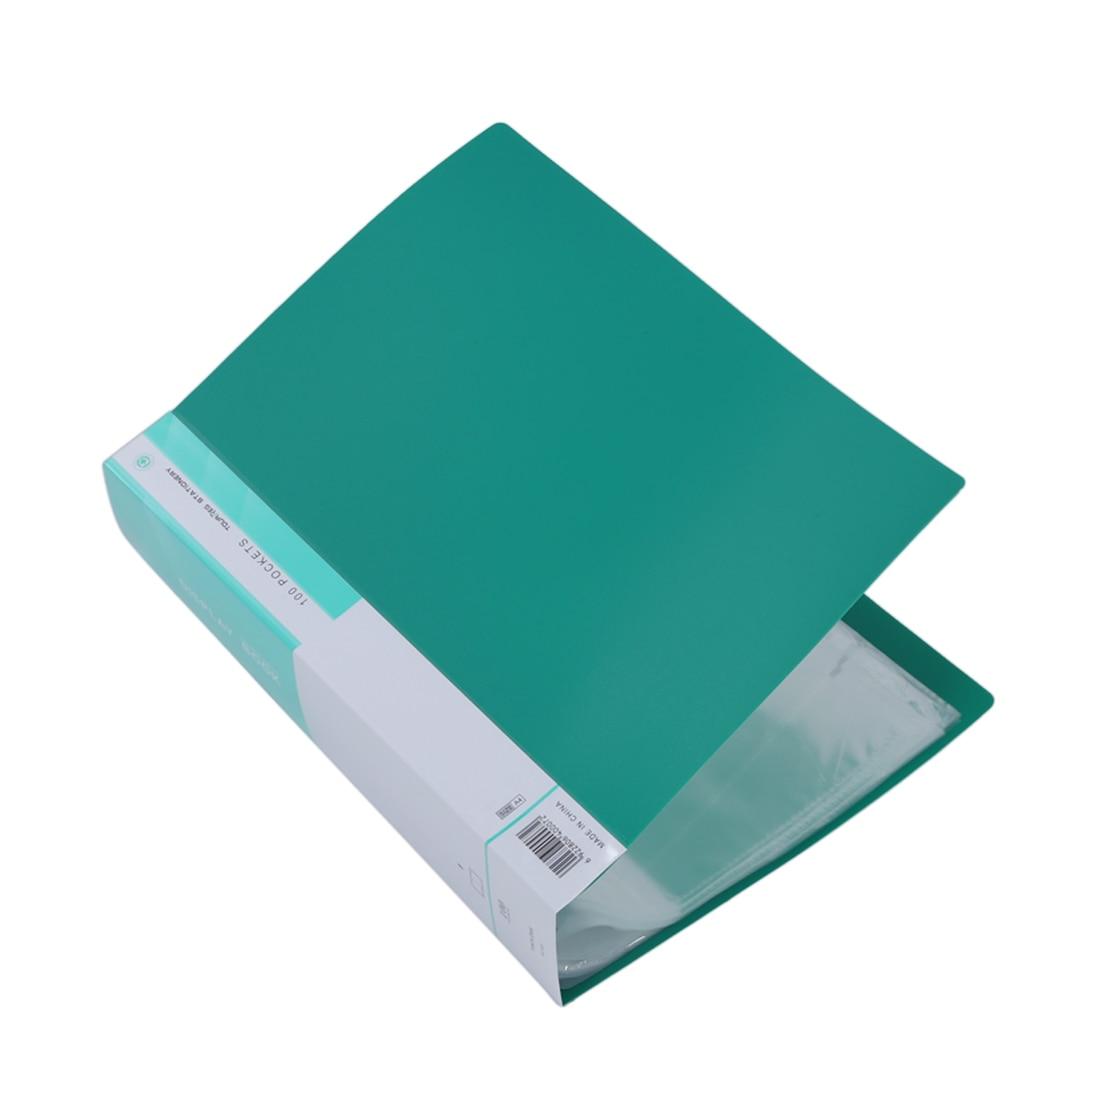 Carpeta portafolio de almacenamiento de documentos de presentación de libro de exhibición de HOT-A4 100 bolsillos